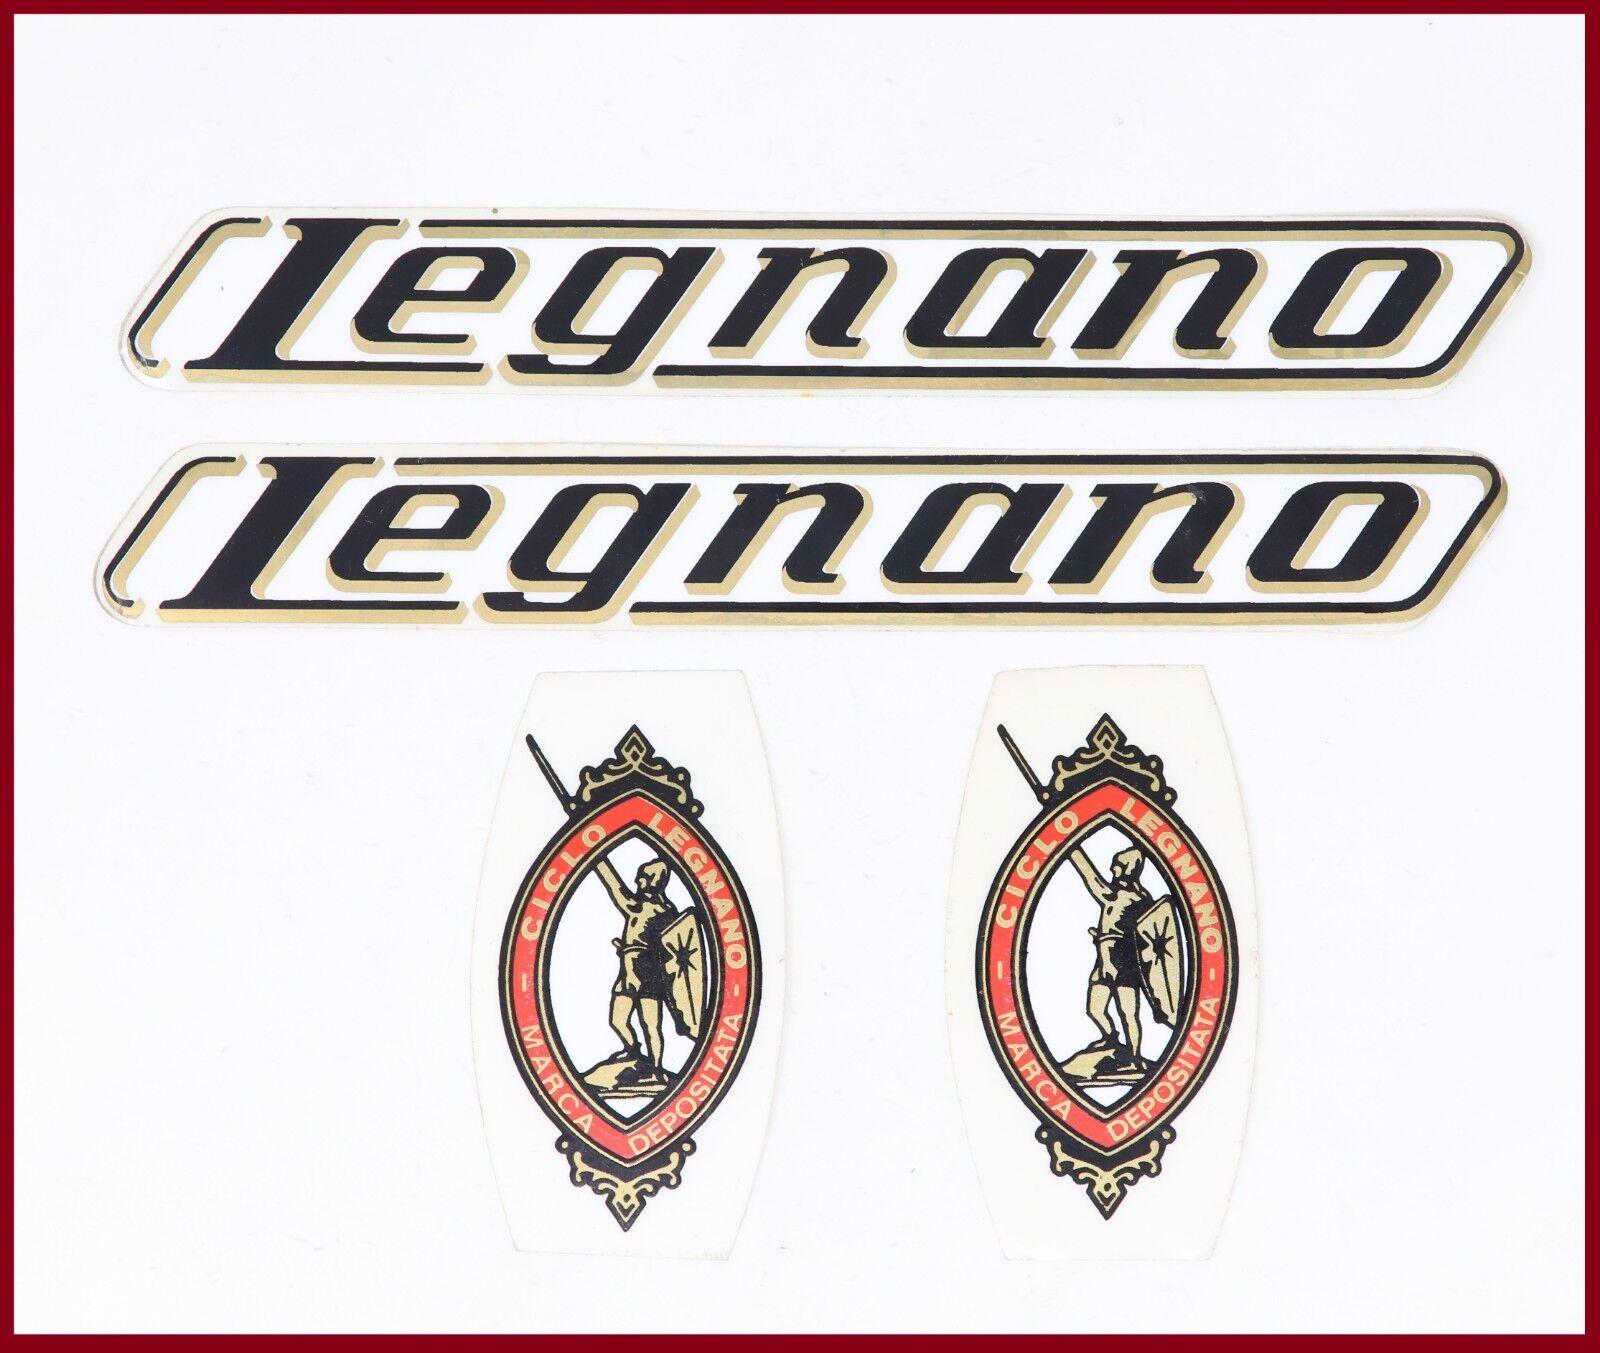 NOS ORIGINAL LEGNANO DECAL SET 70S 80S VINTAGE - DOWN TUBE SEAT + HEAD TUBE